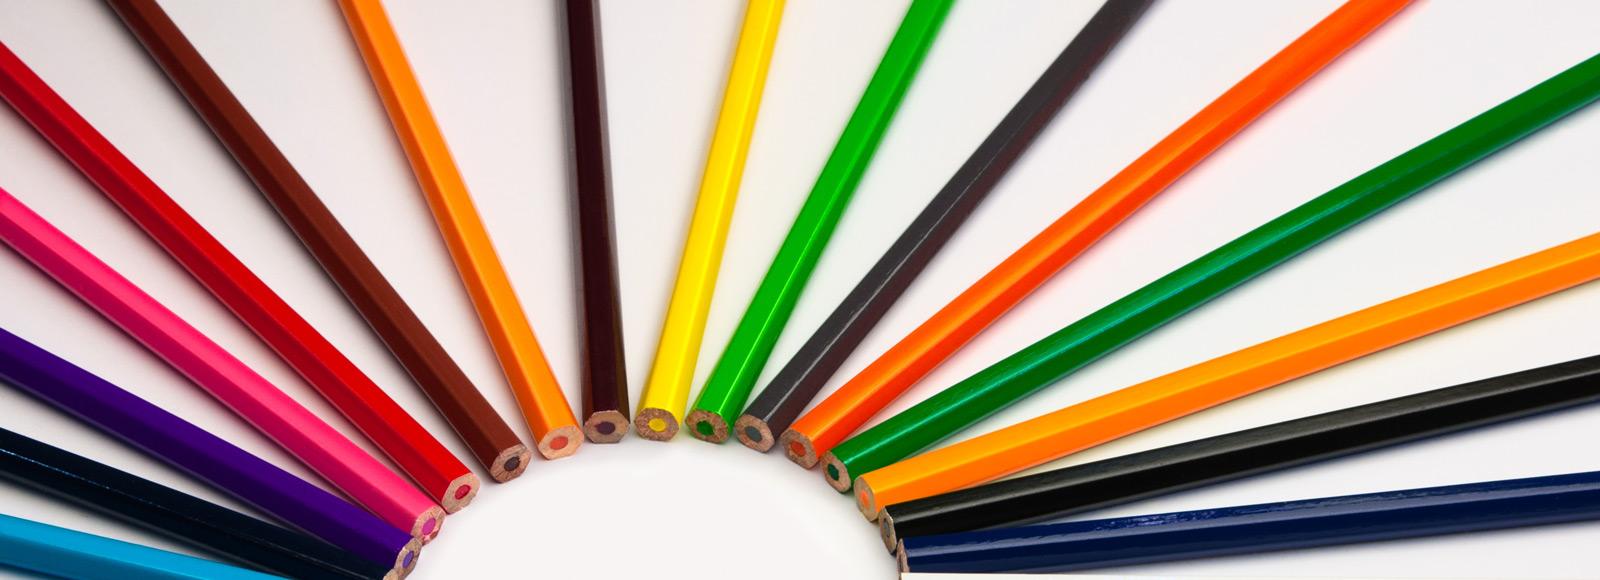 Pencils shaped into a lightbulb 'ideas'